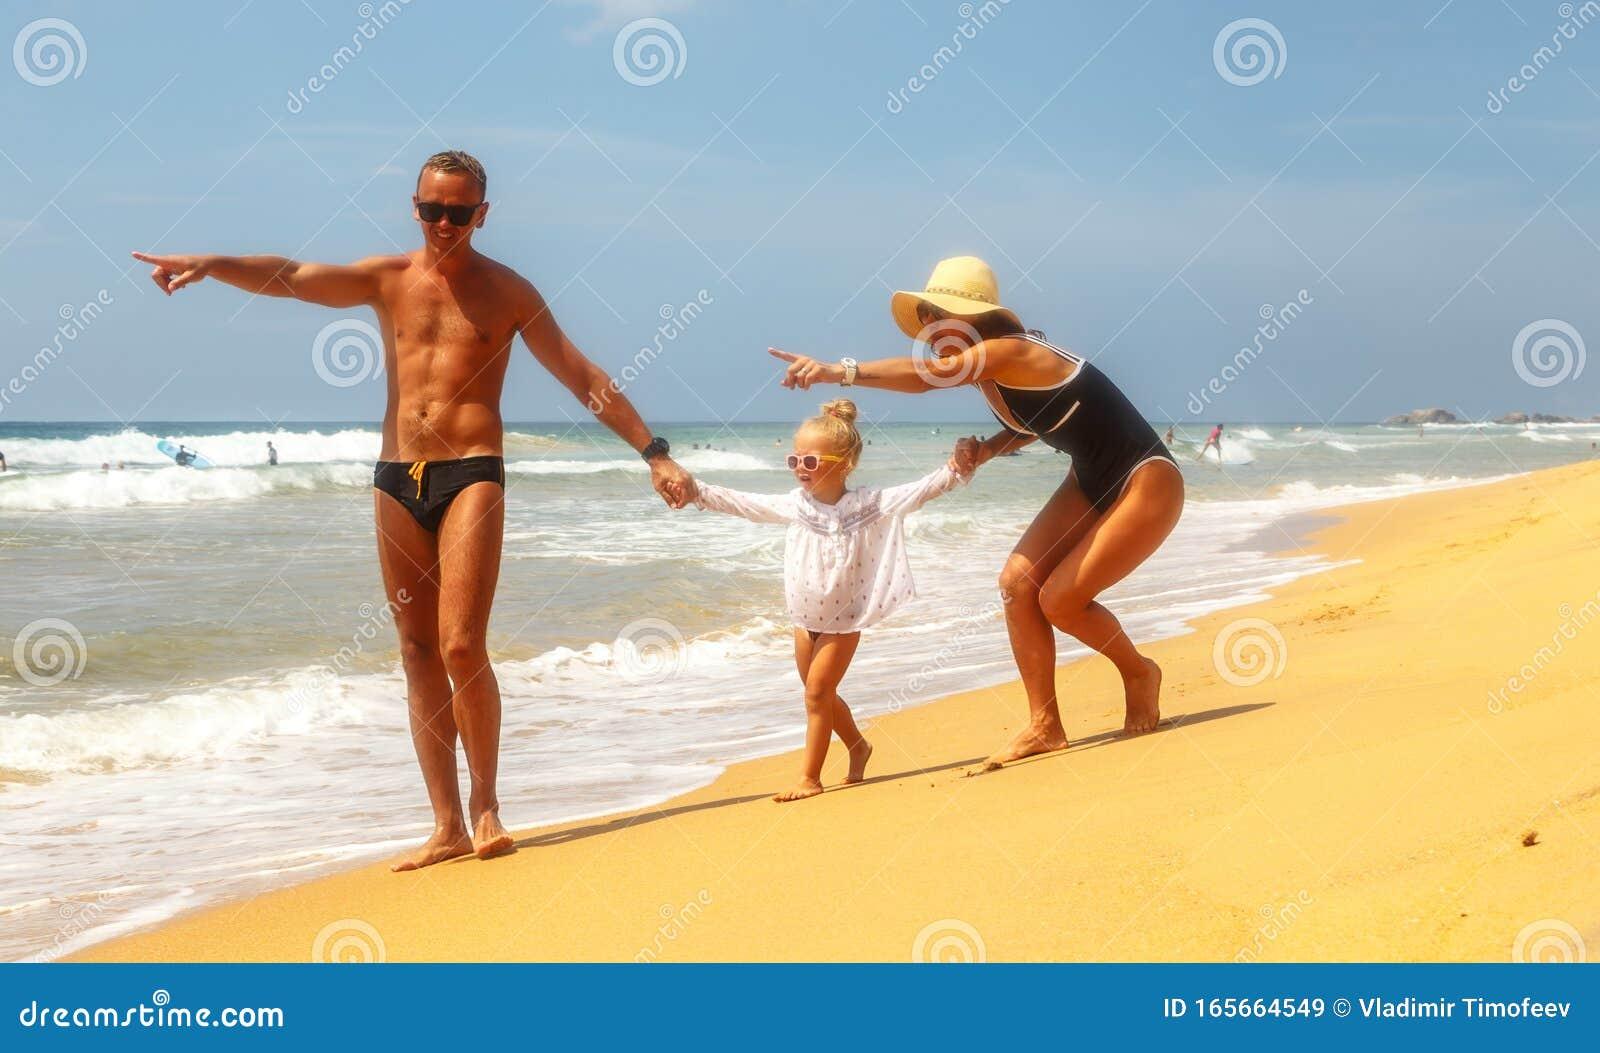 Resort dads moms and Live Cam